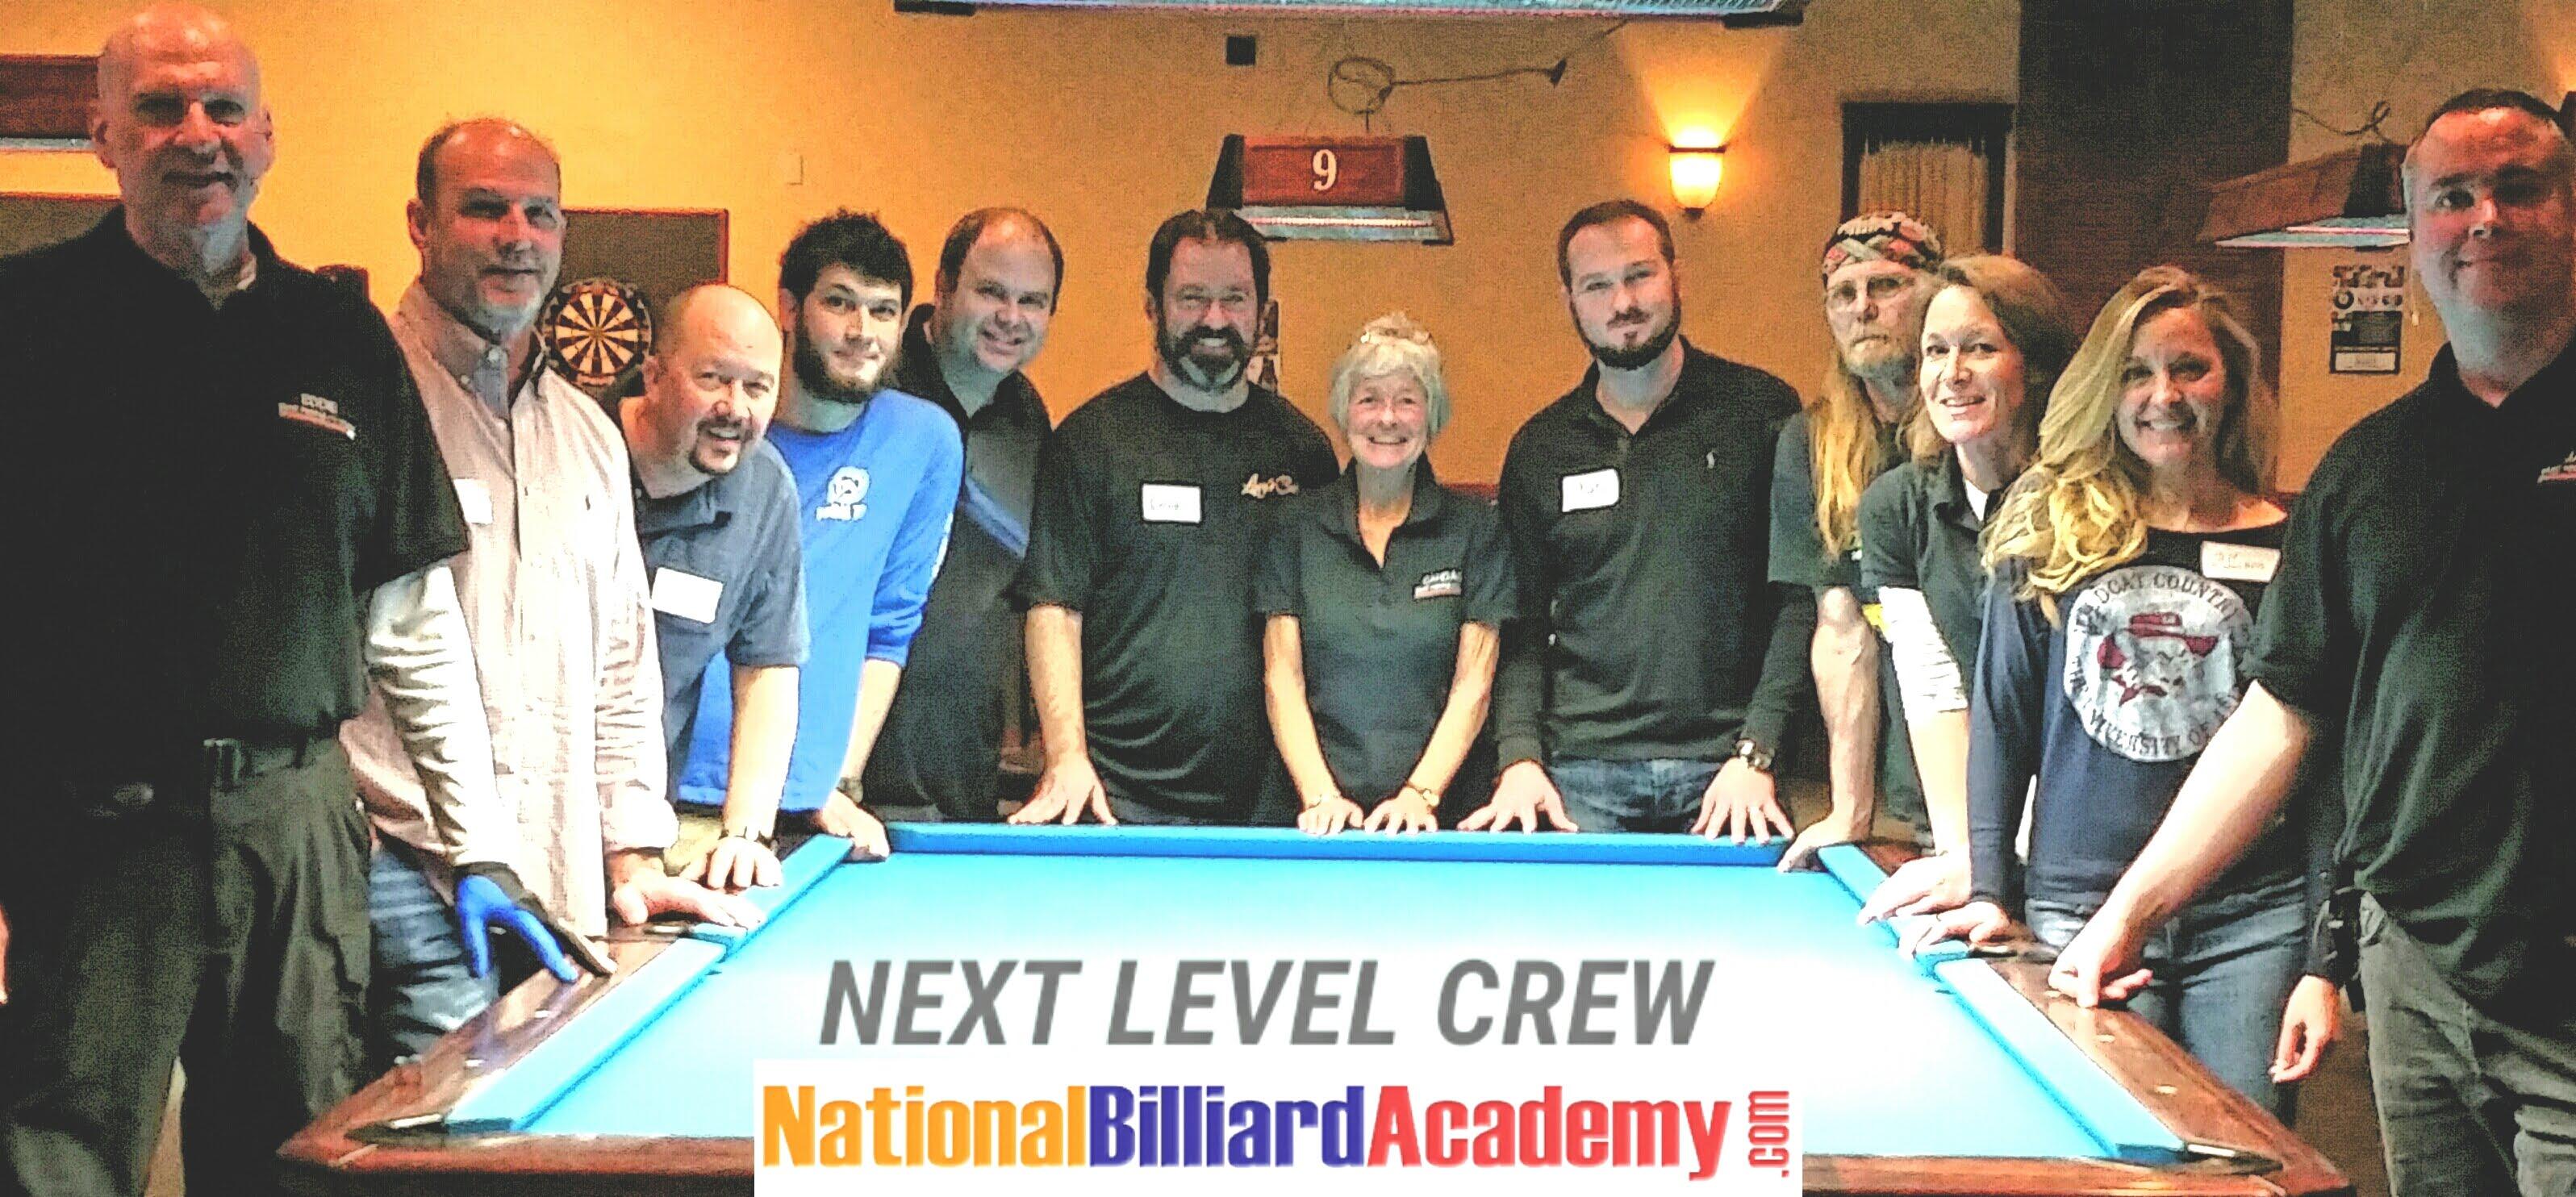 Pool School at National Billiard Academy